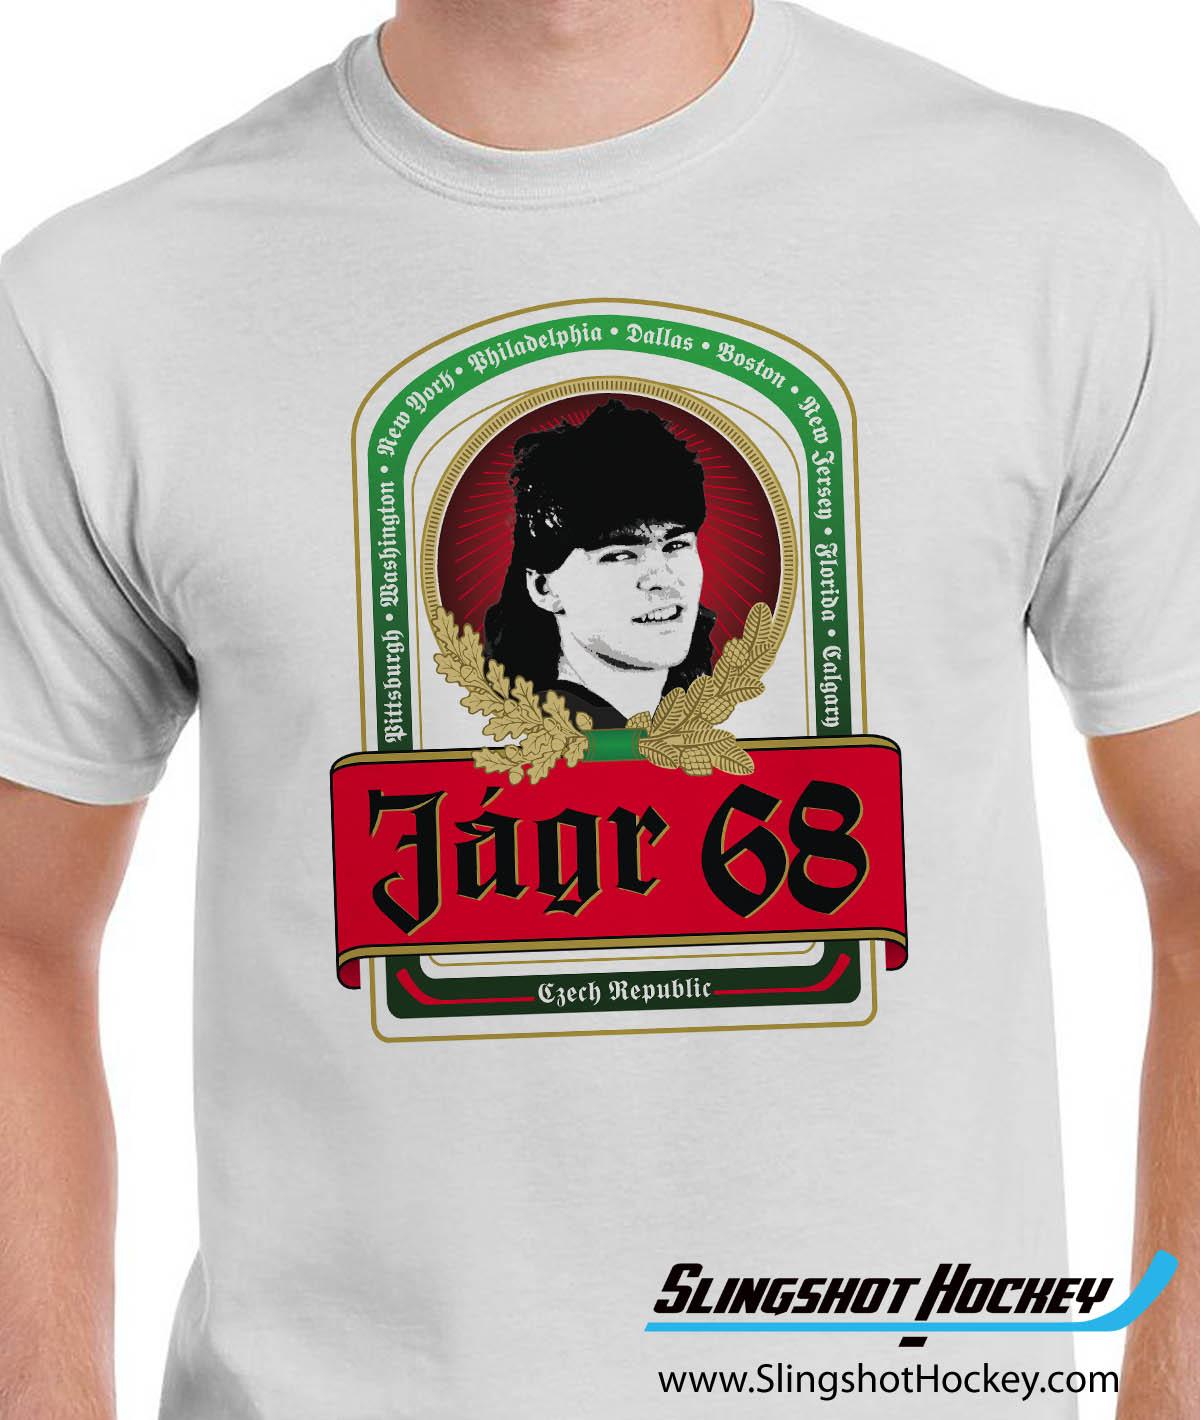 b9a70dceac45 Jagr 68 Shirt Sale! - Slingshot Hockey